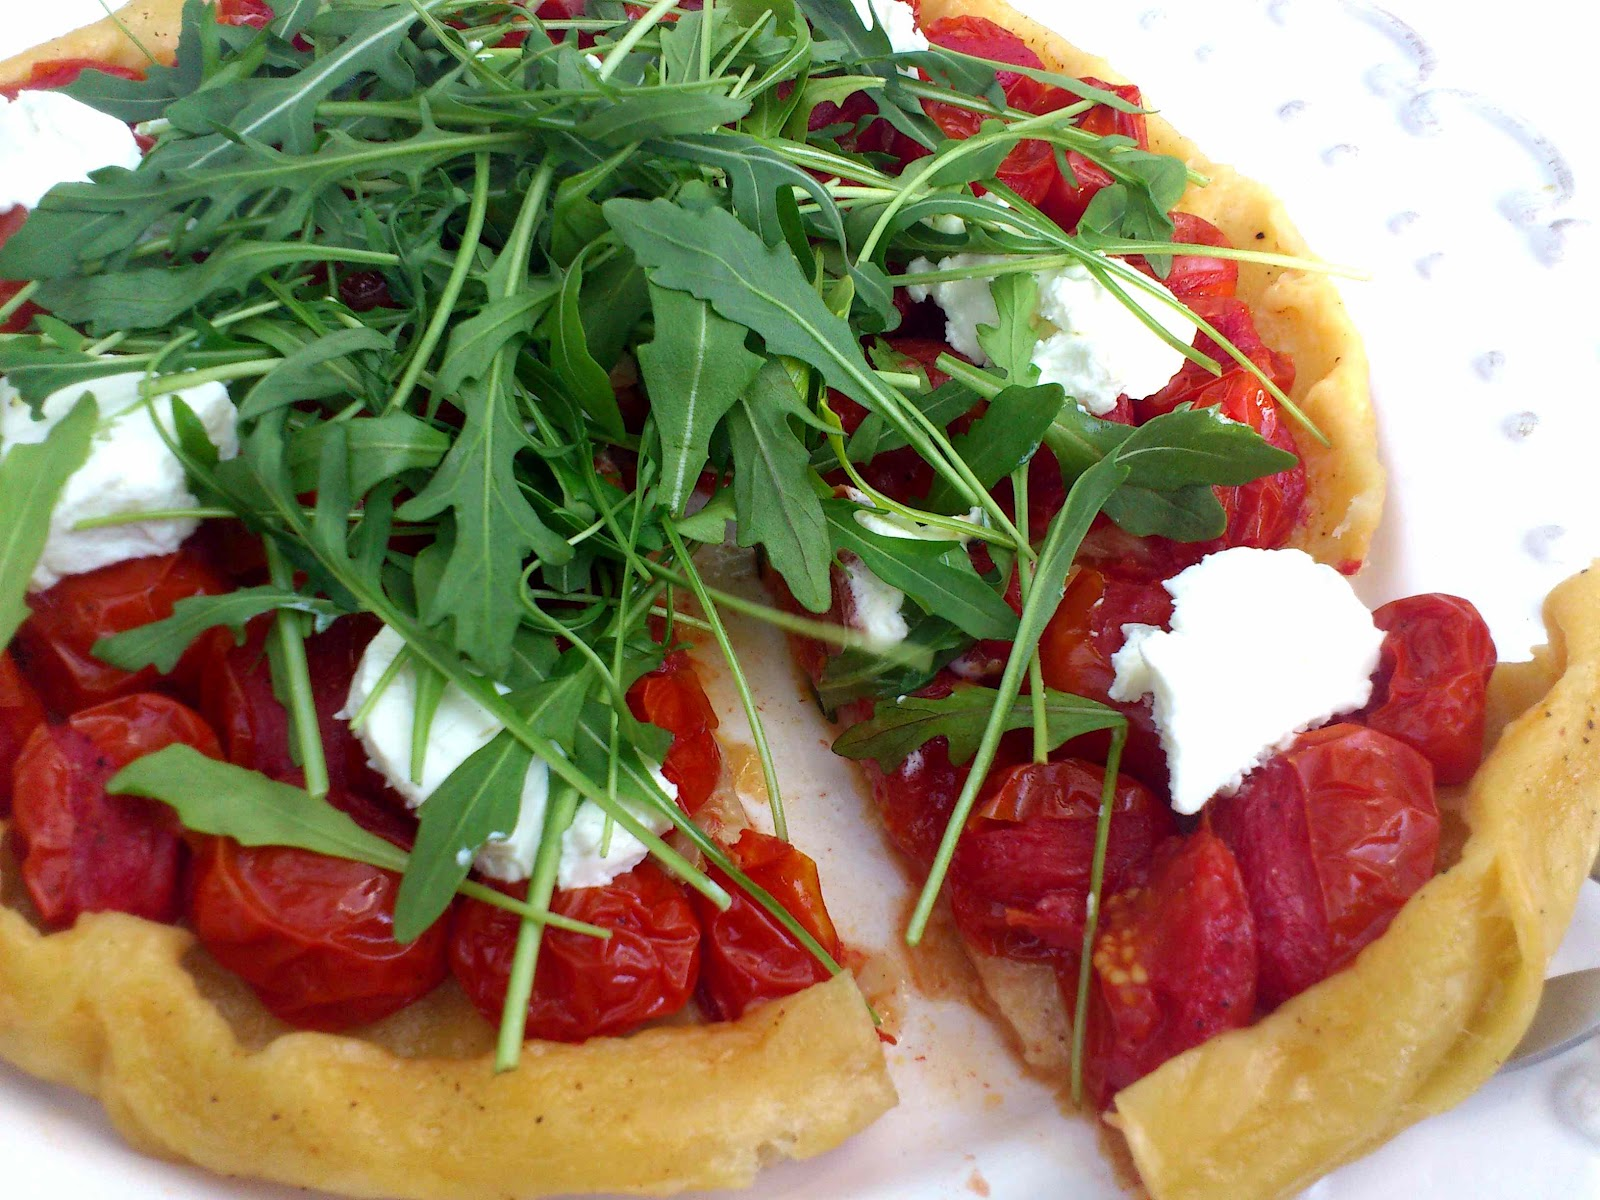 UndomestiKATEd: Tomato tarte tatin